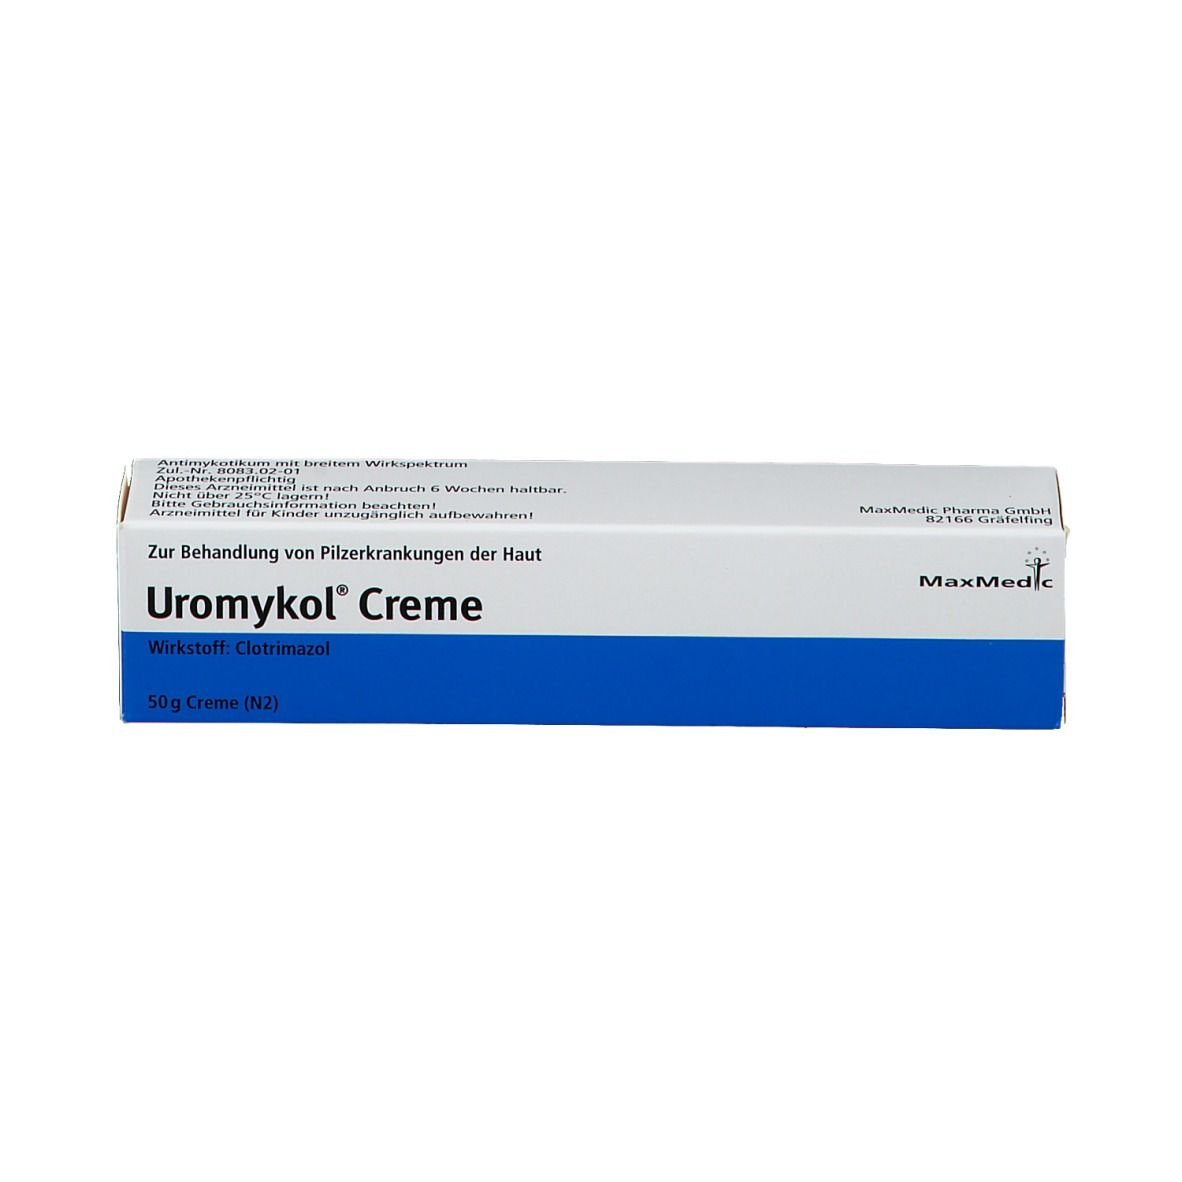 Uromykol® Creme